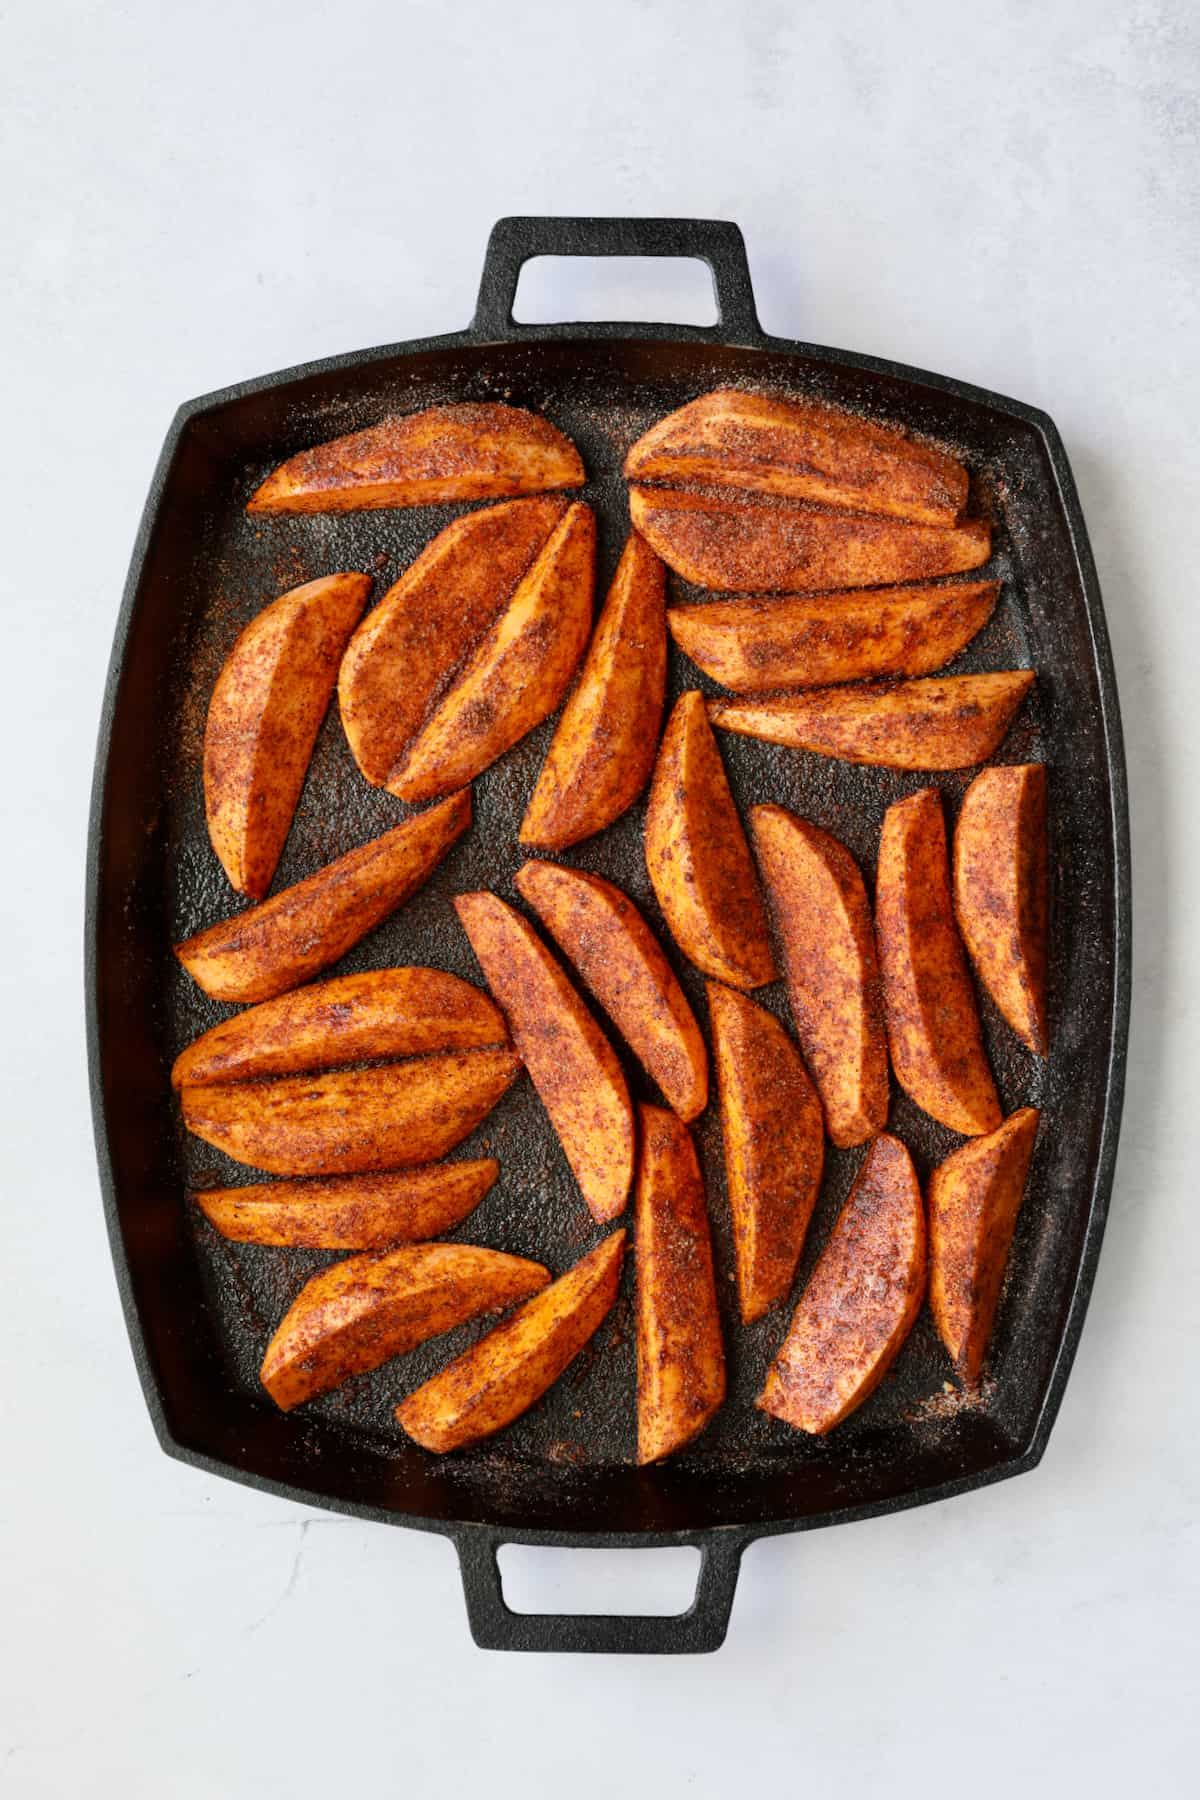 Southwestern Sweet Potato Wedges on cast iron pan with seasoning mix before being roasted.